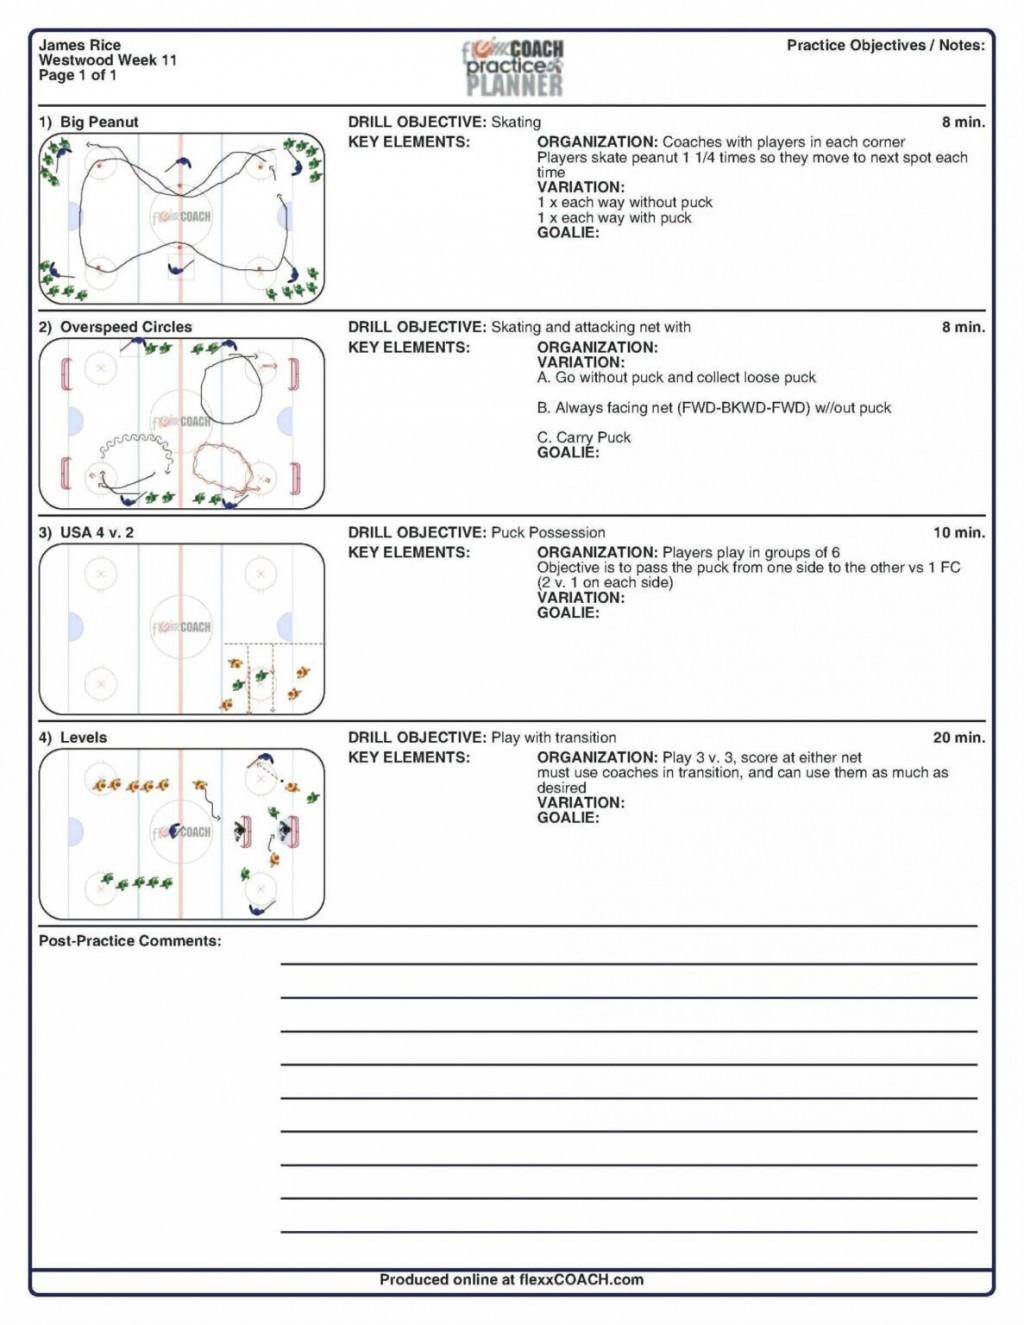 006 Dreaded Basketball Practice Plan Template High Def  Doc Pdf Free PrintableLarge